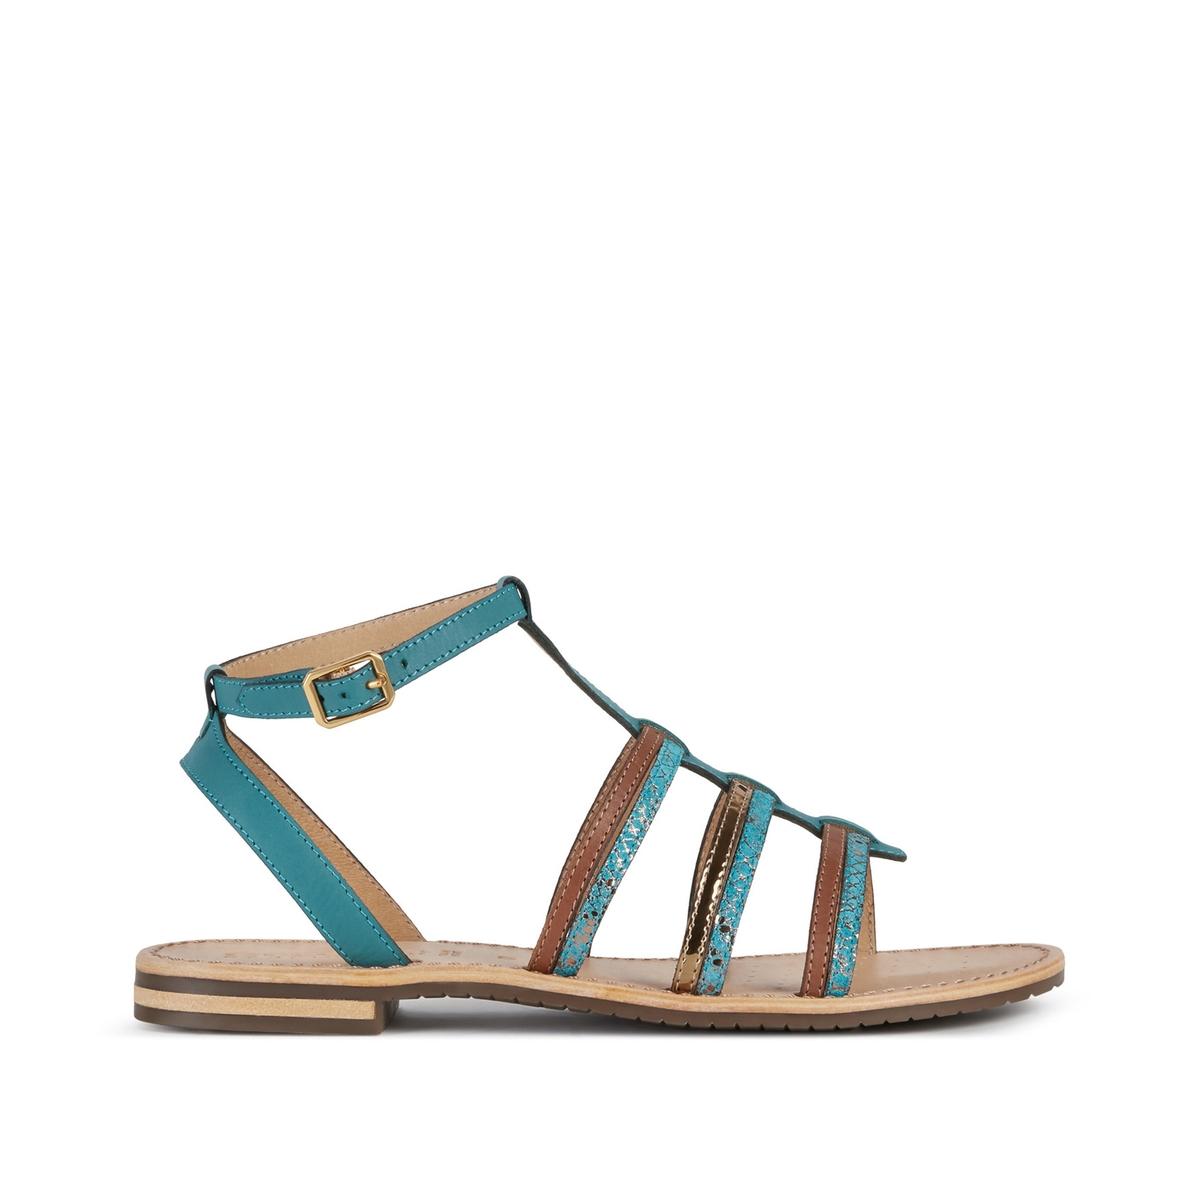 Sandalias de piel Sozy